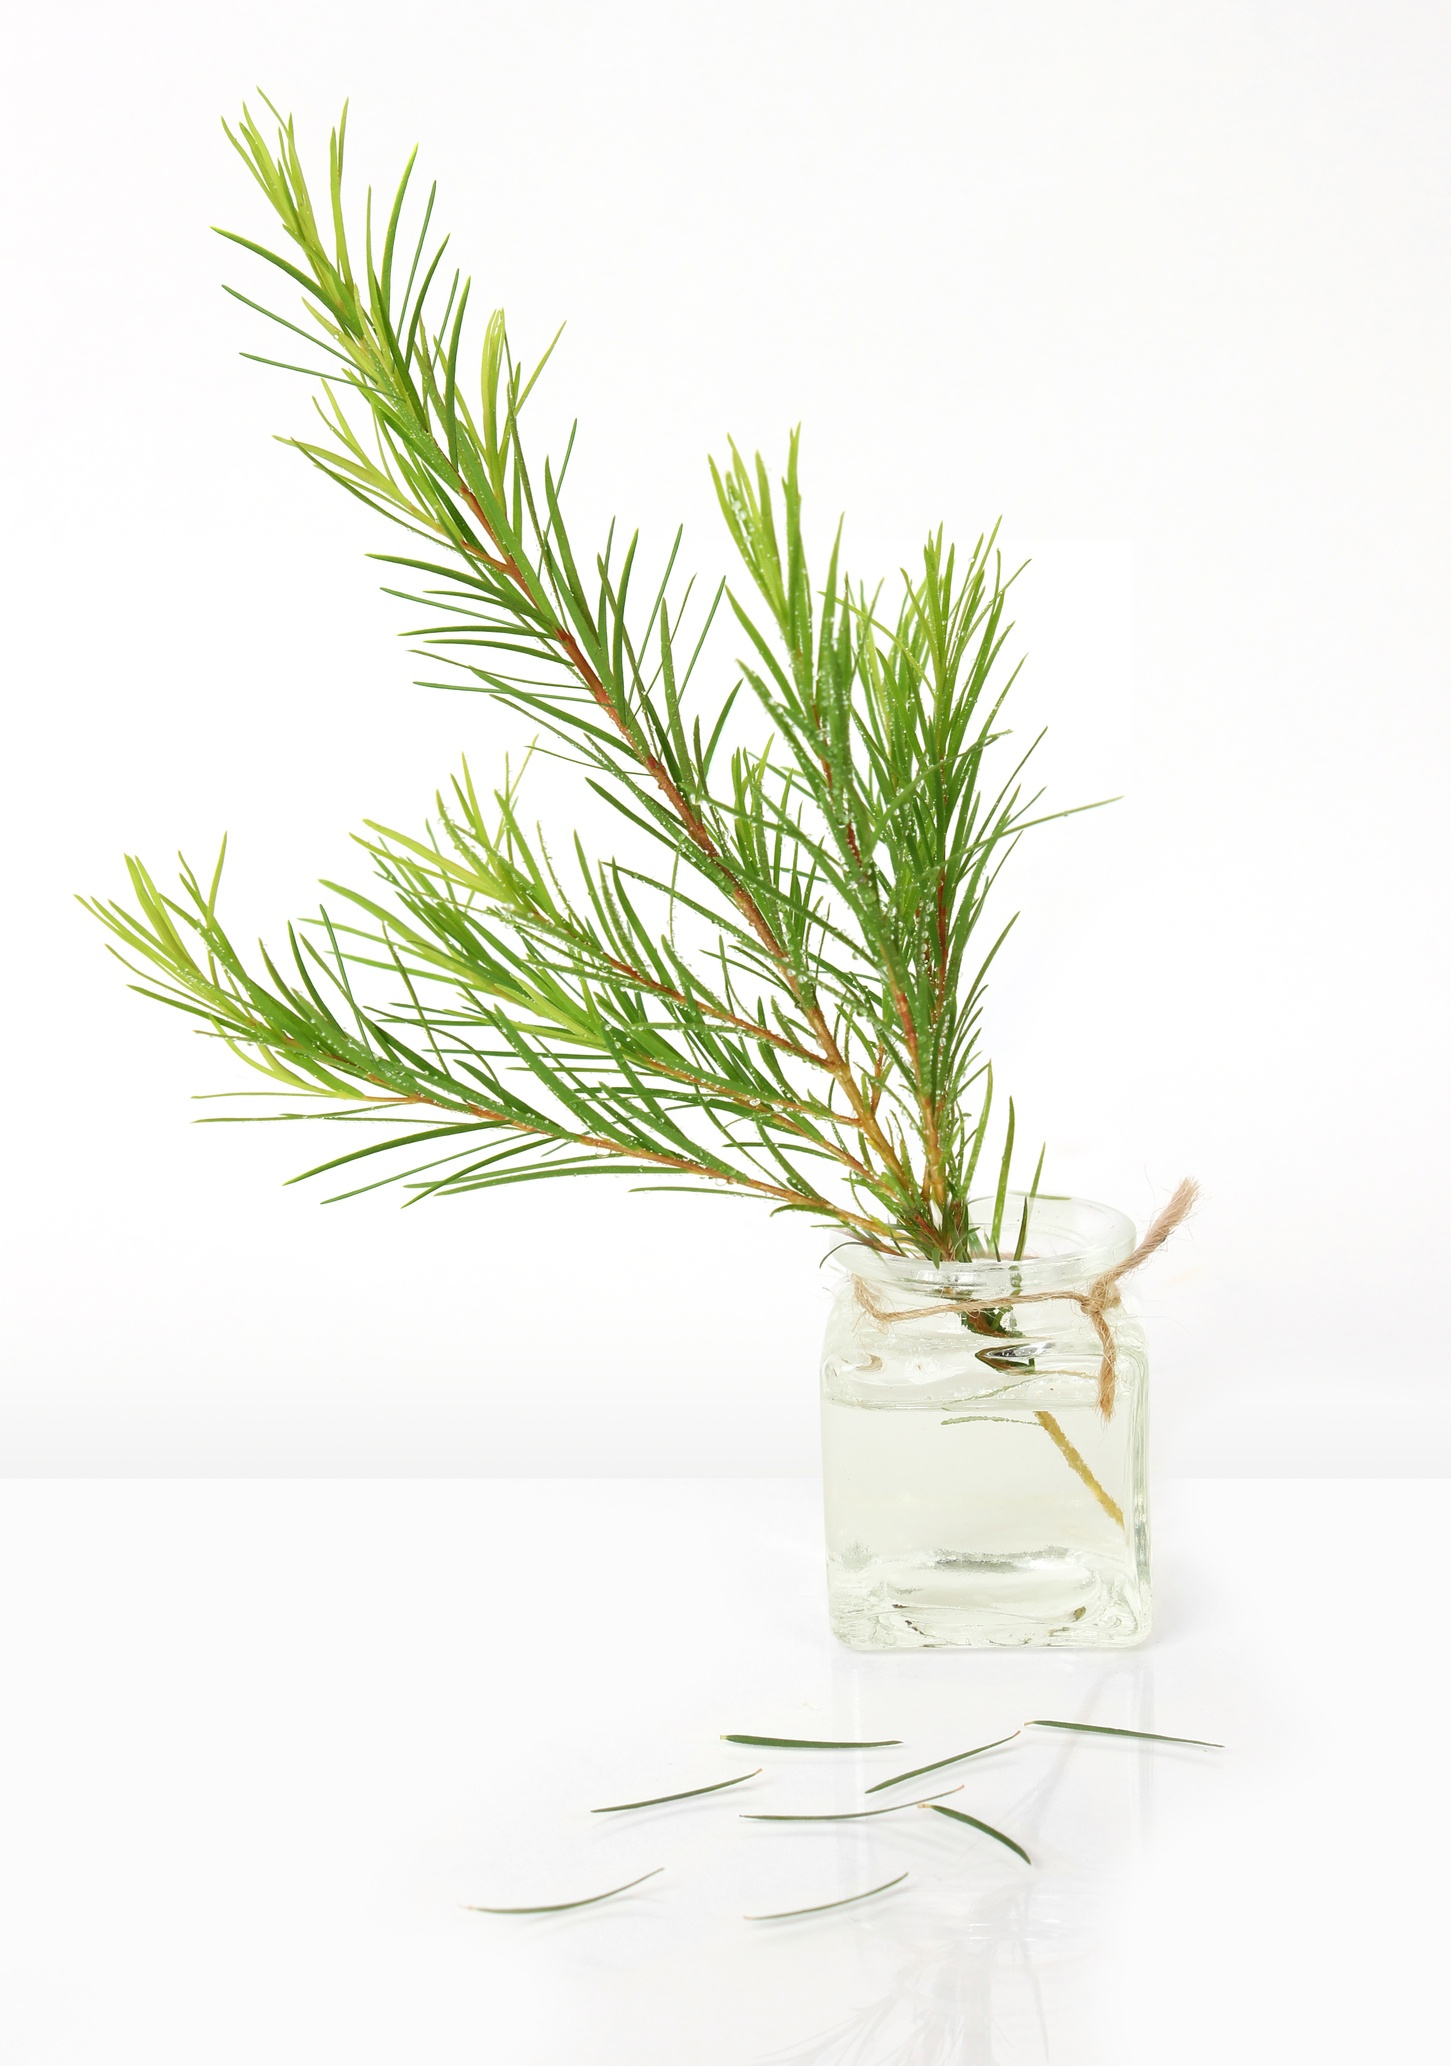 iStock-850937526 tea tree in bottle.jpg